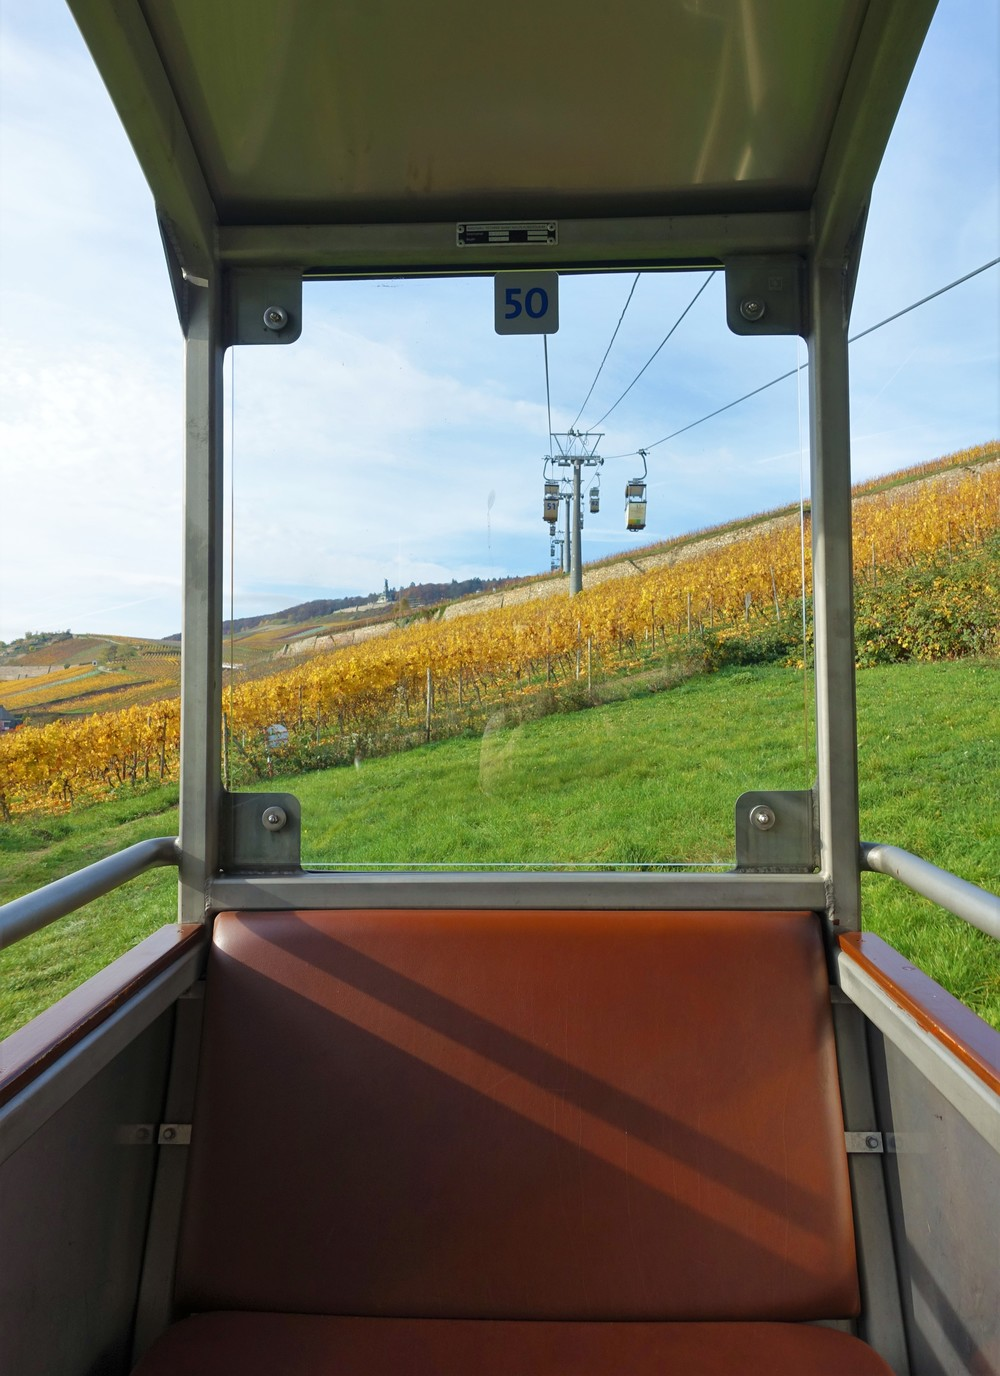 Seilbahn Rüdesheim - Cable Car